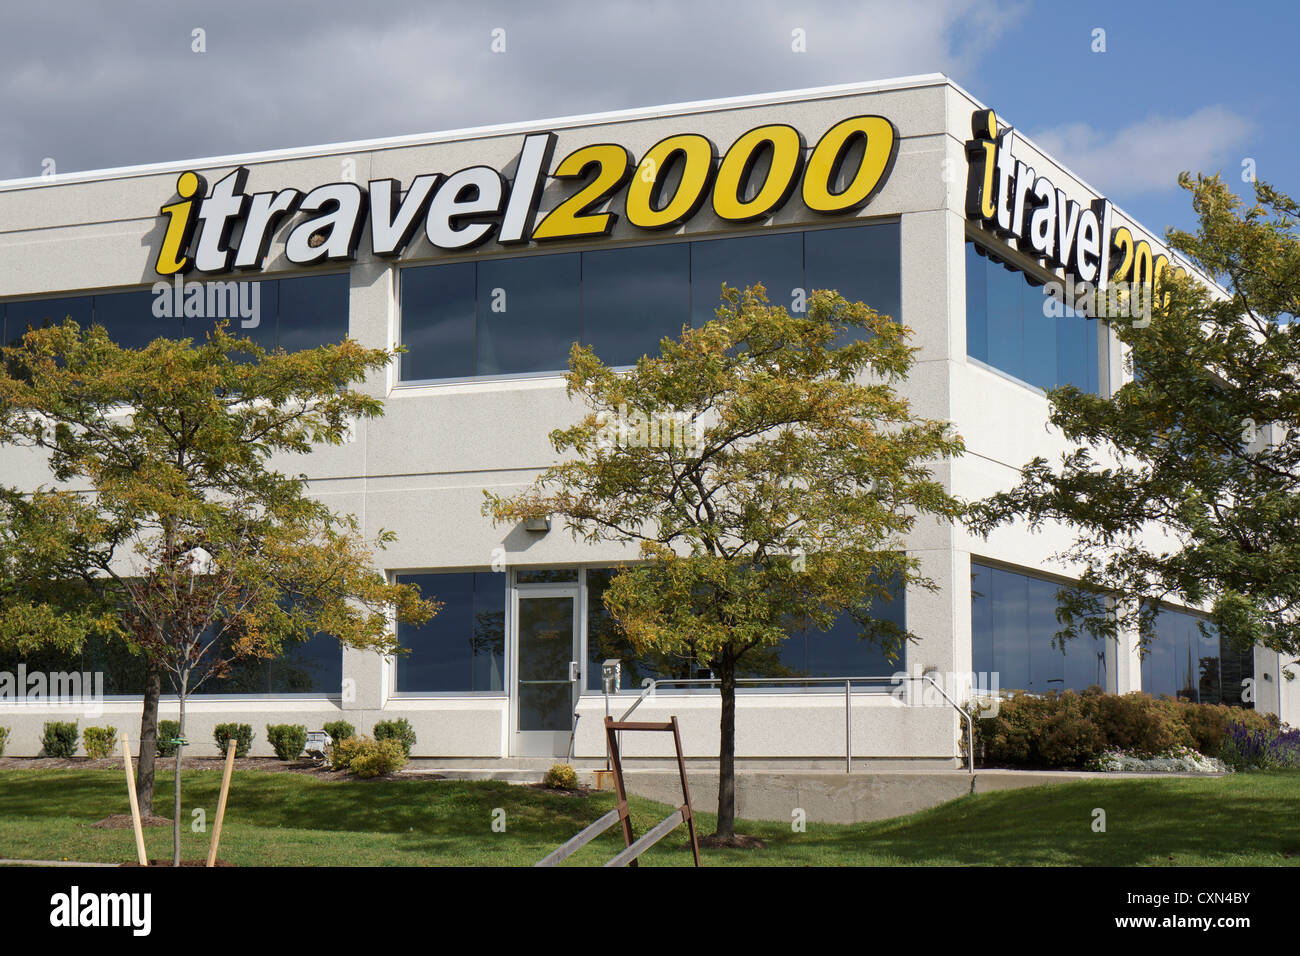 iTravel2000, Reisebüro Bürostandort, Mississauga, Ontario, Kanada Stockbild